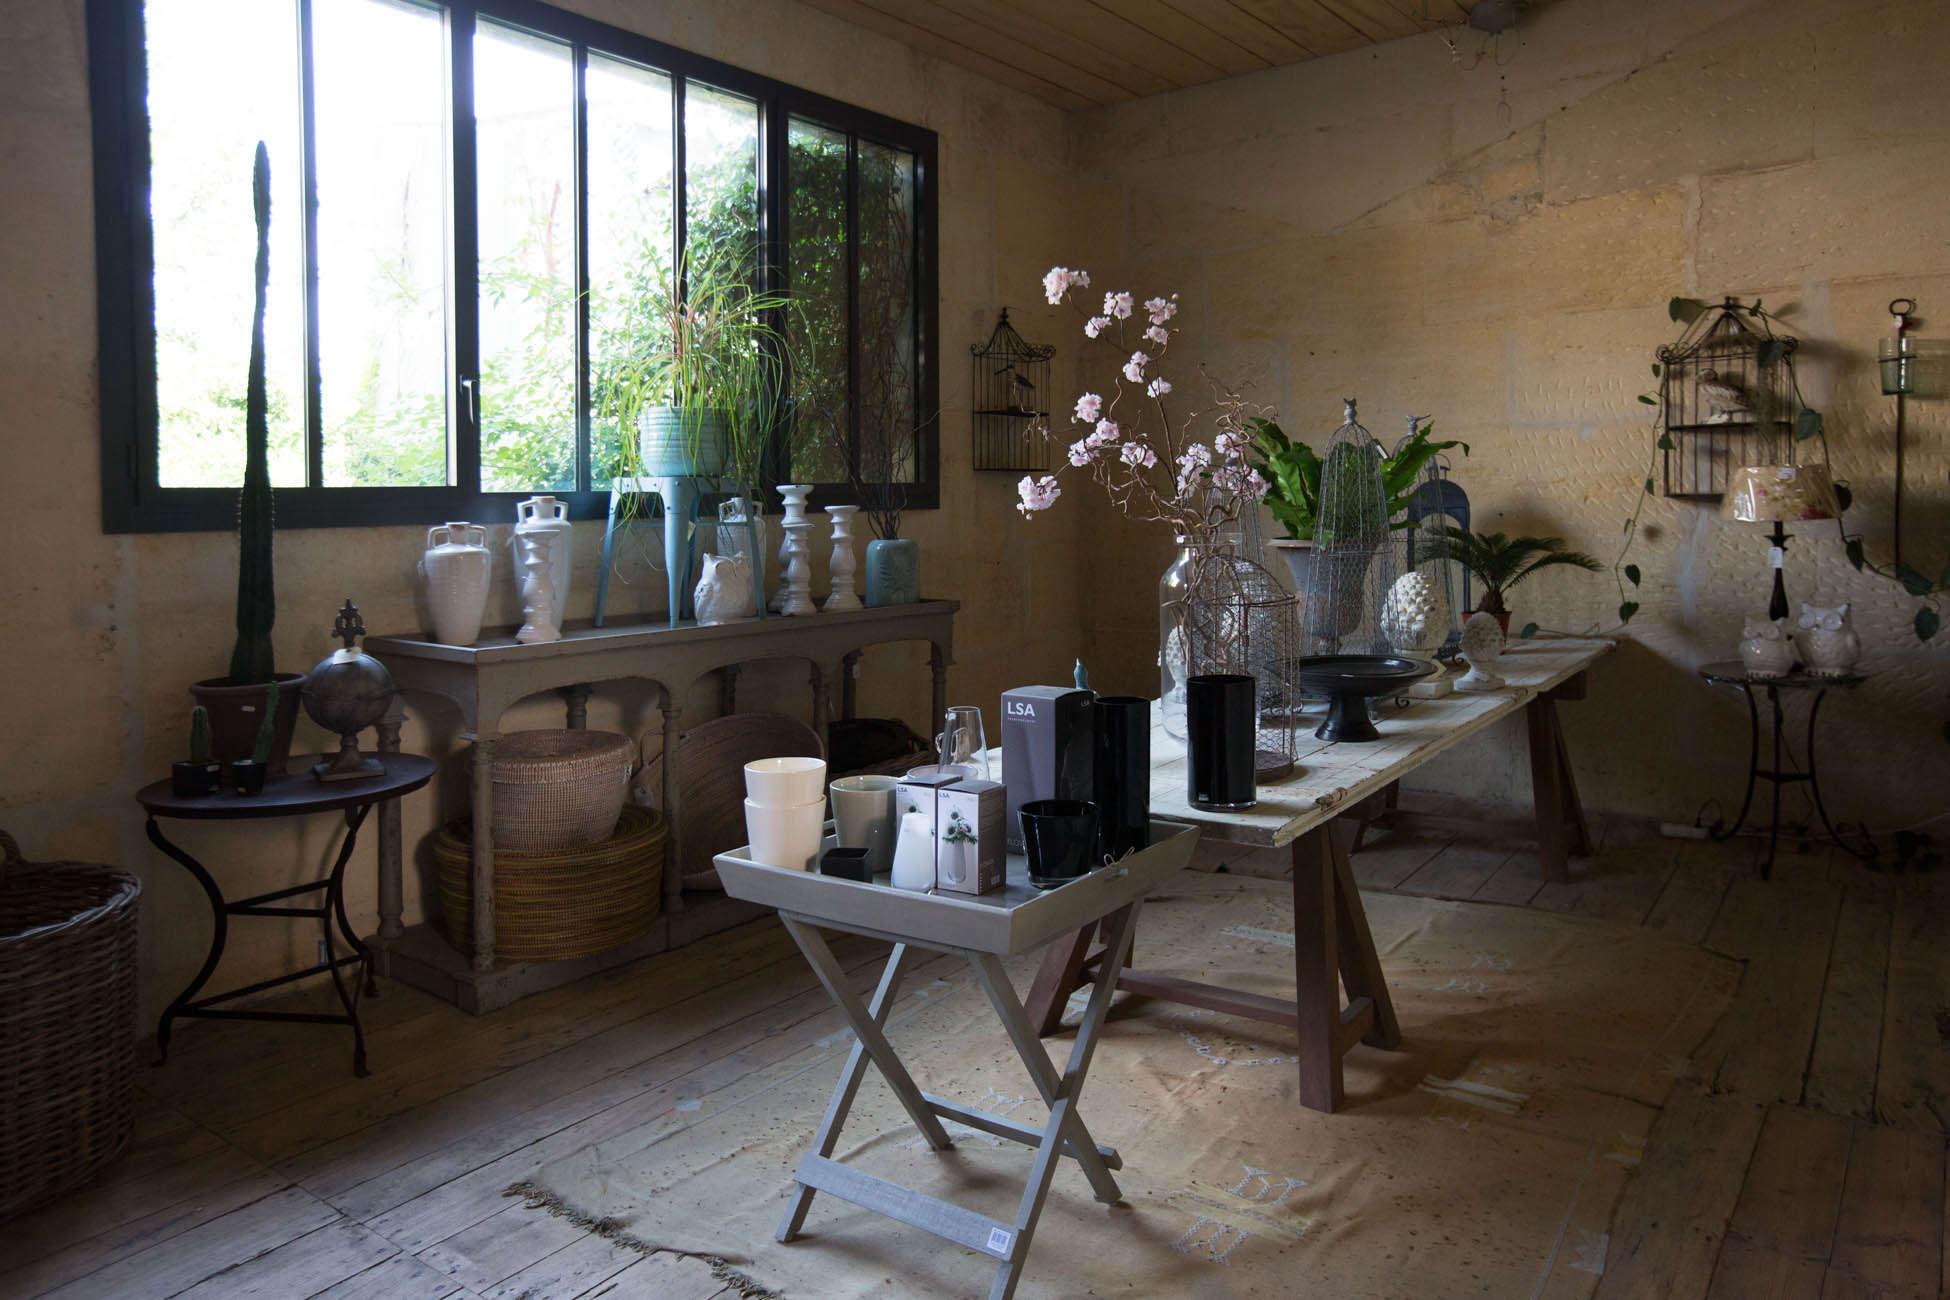 Ambre-store-france-mimi-giboin-gardenista-054